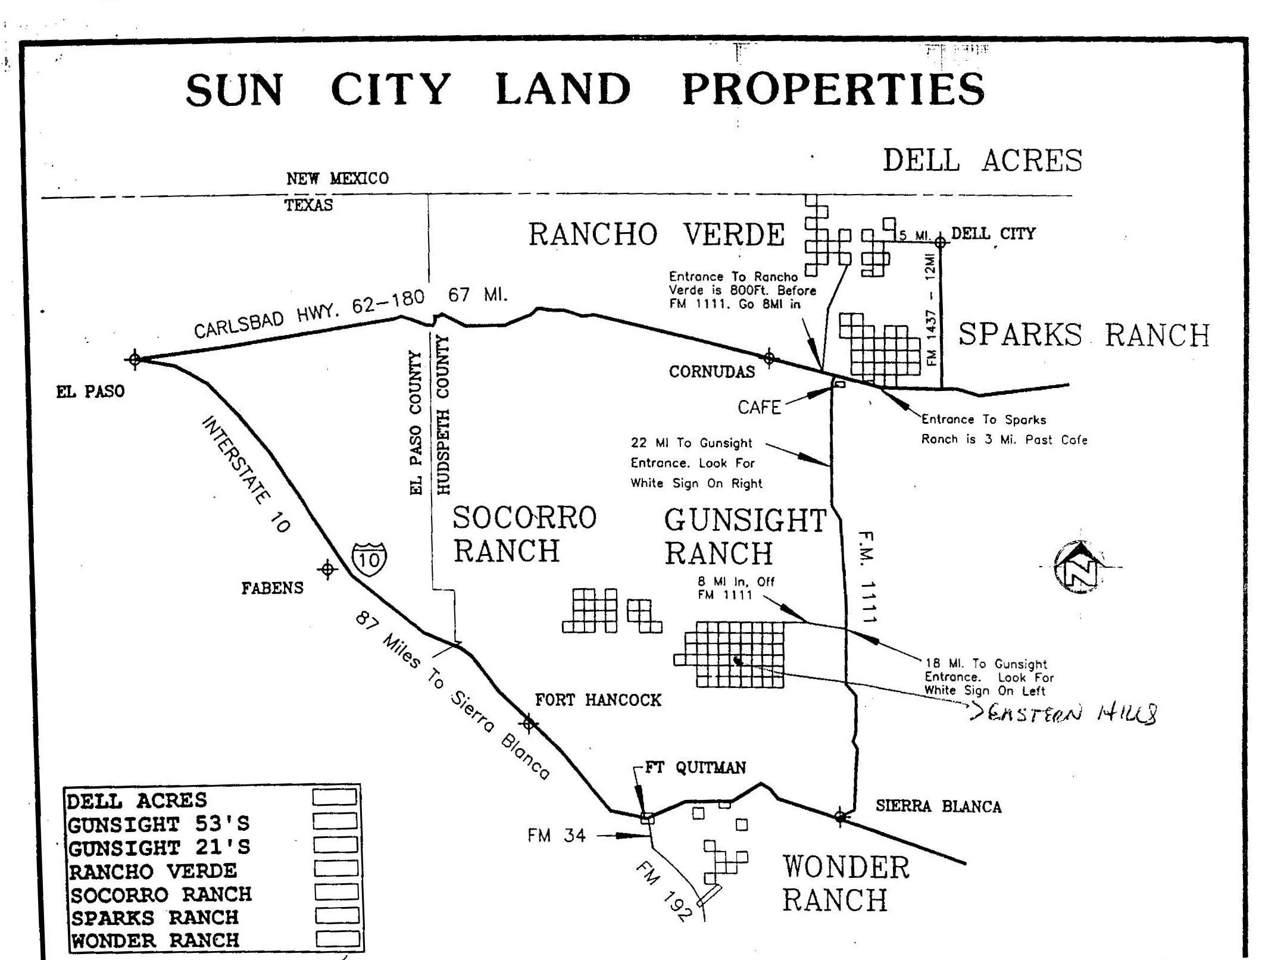 19 SEC 13 Psl Gunsight Ranch Lot 7 - Photo 1